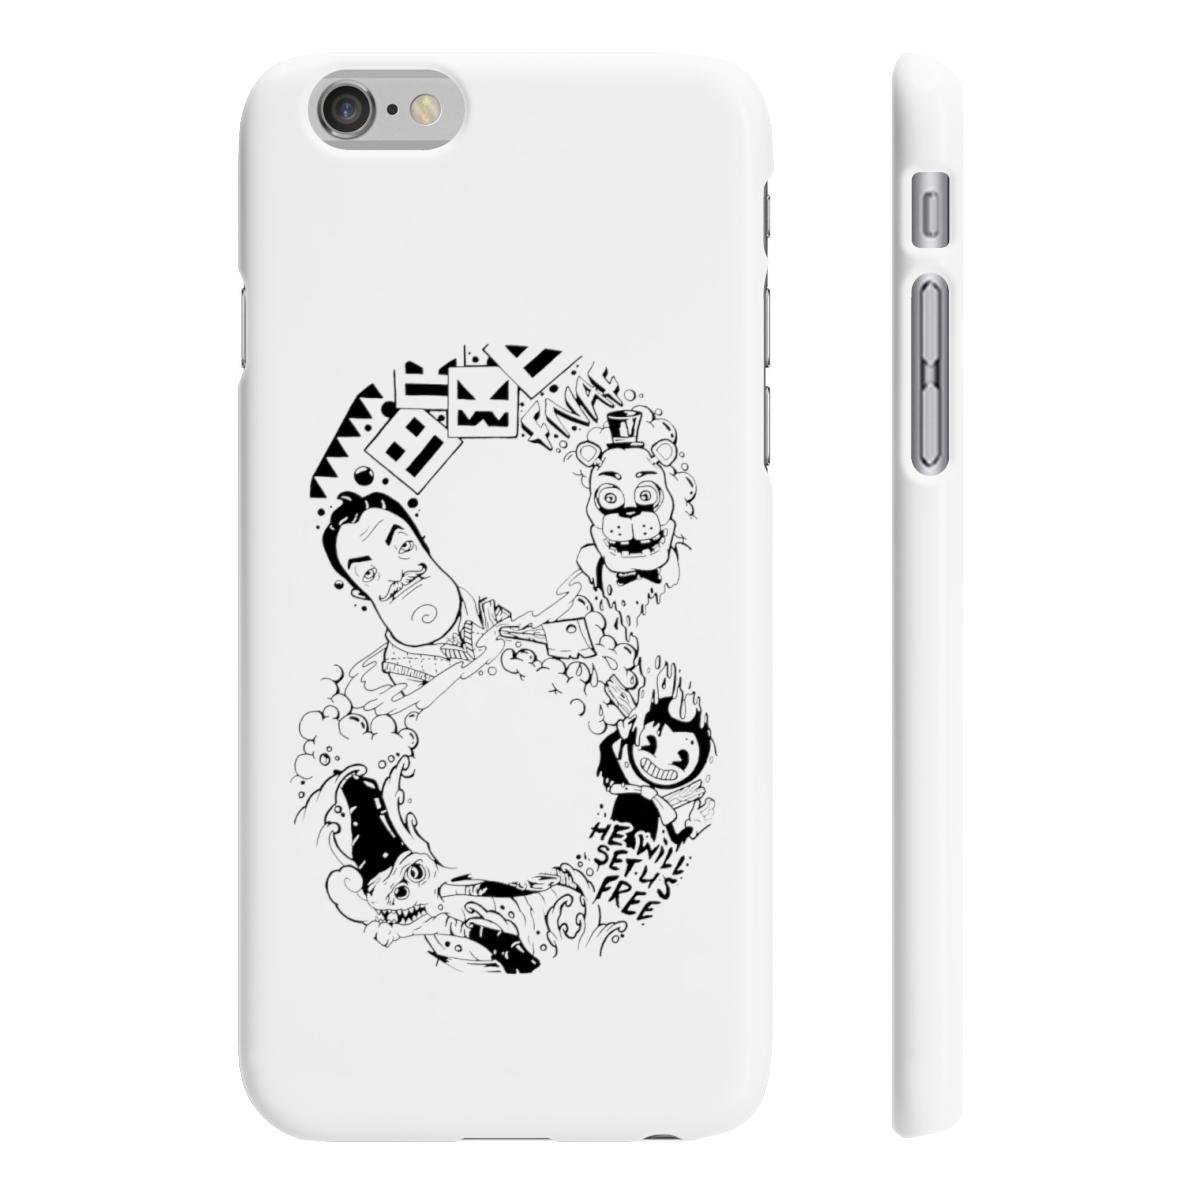 8Bit Phonecase - White